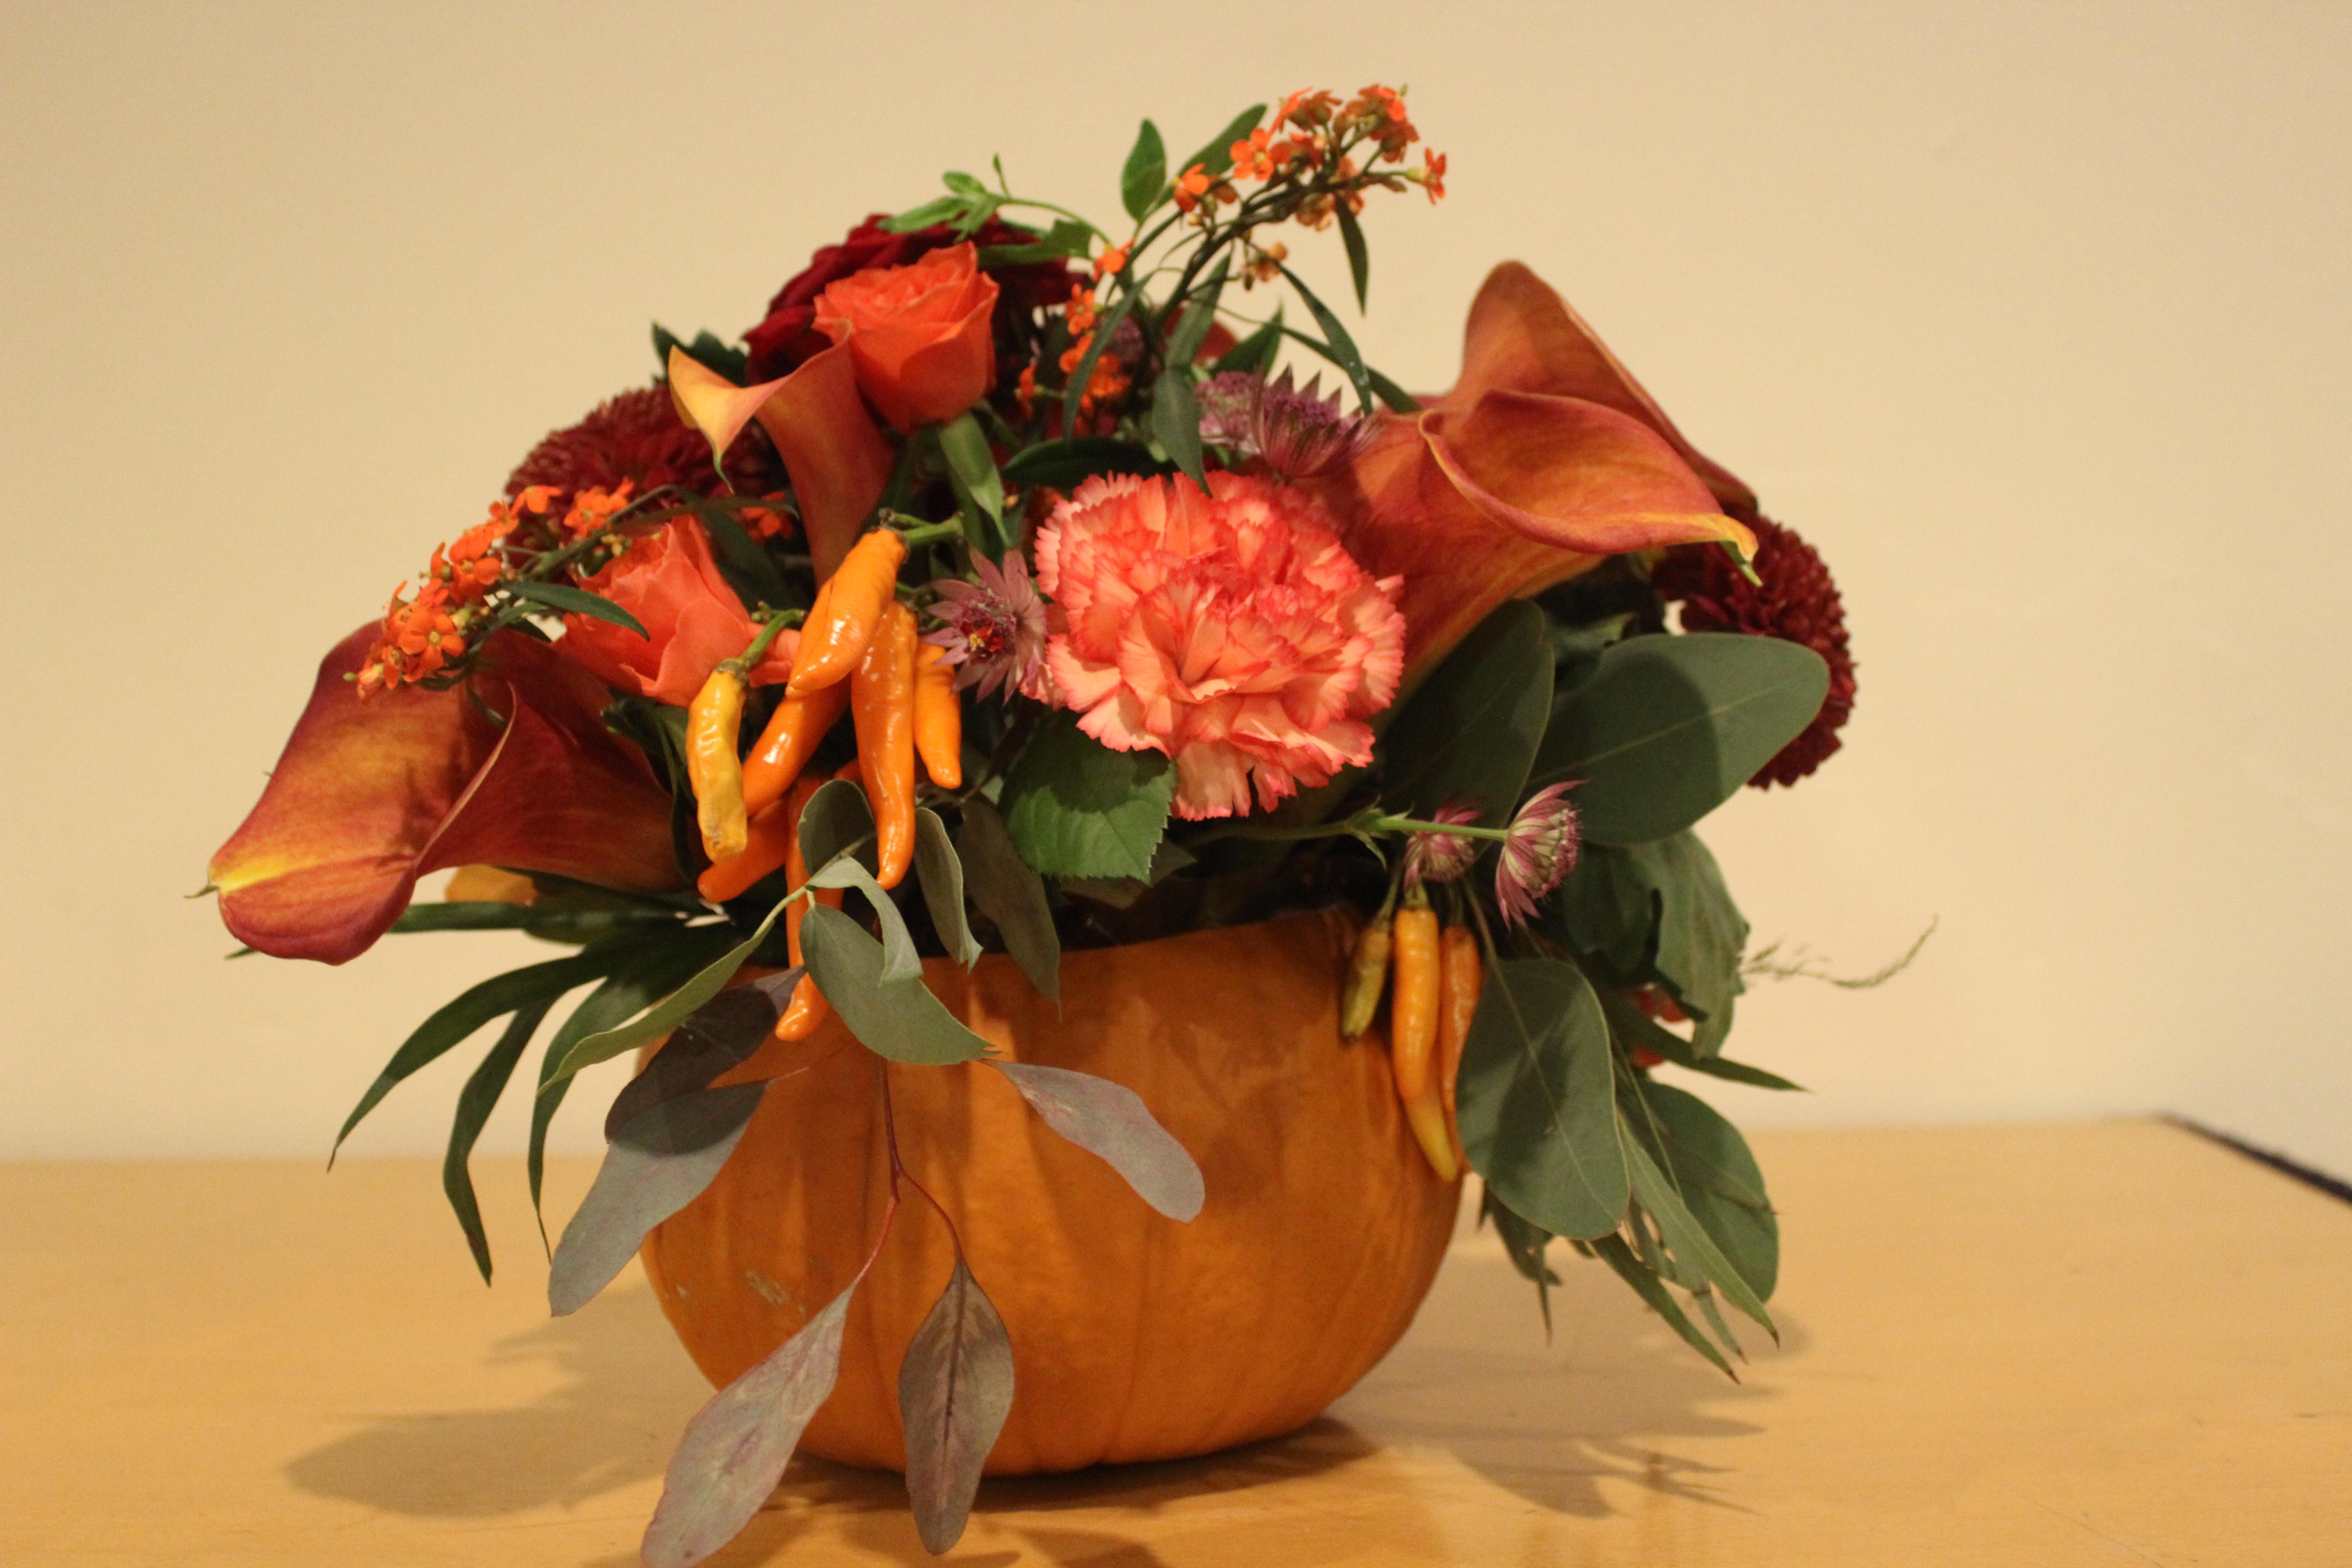 Autumn Meeting 2016 - Flowers